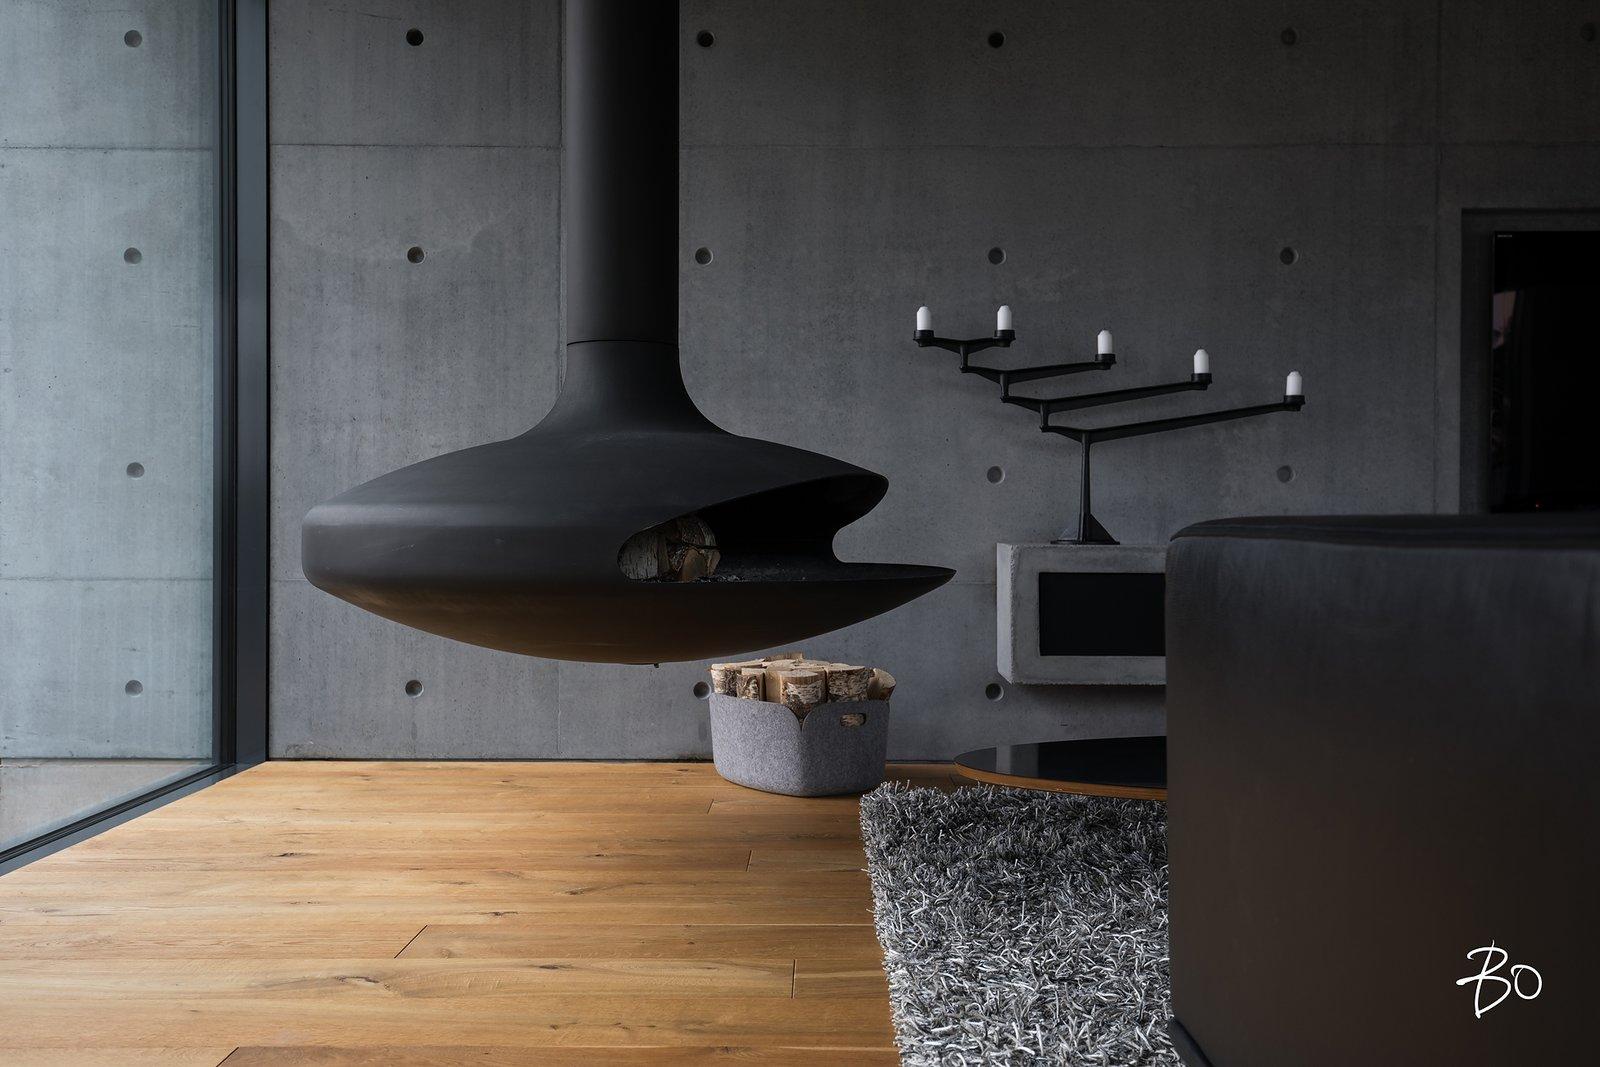 Living room fireplace / Gyrofocus  (Dominique Imbert 1968) villAma by Kari Leino